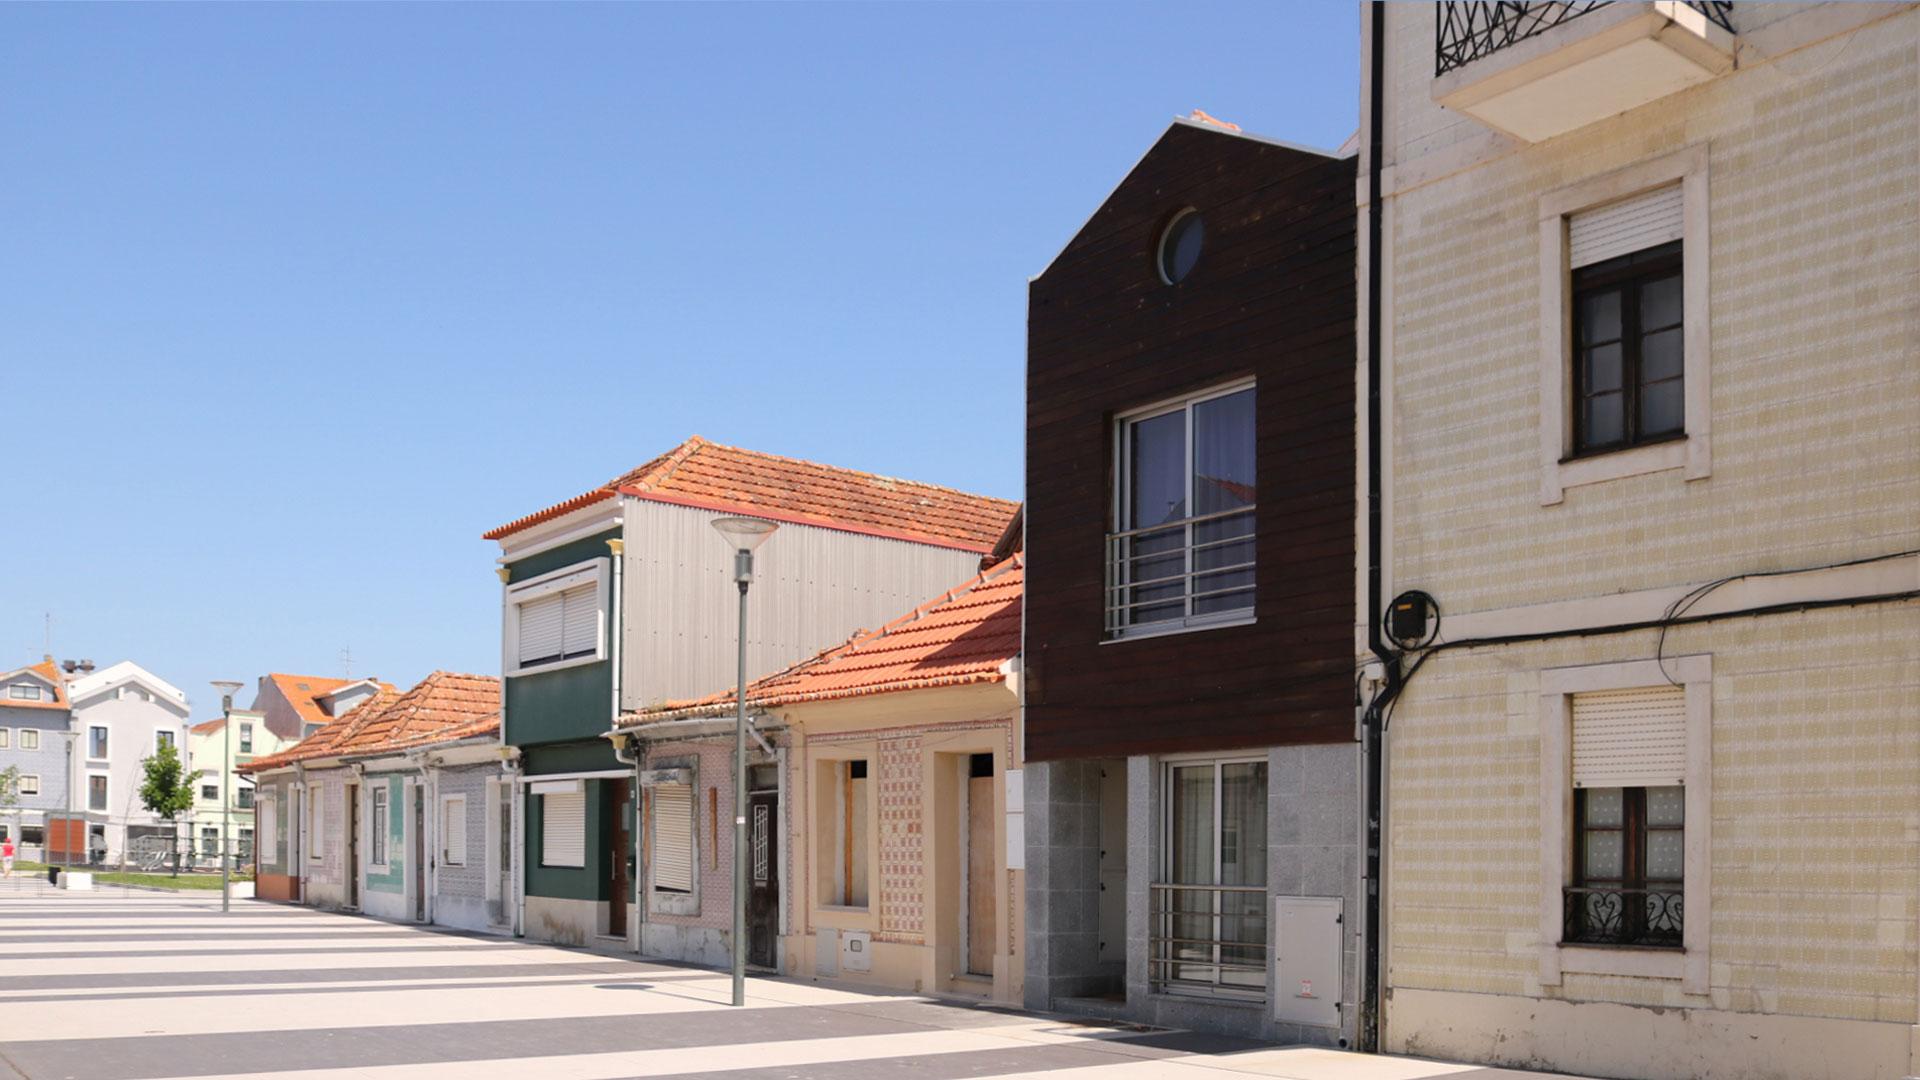 Alboi-Aveiro-ville-real-estate-imobiliaria-comprar-arrendar-vender-moradia-apartamento-casa-t0-t1-t2-t3-t4-2